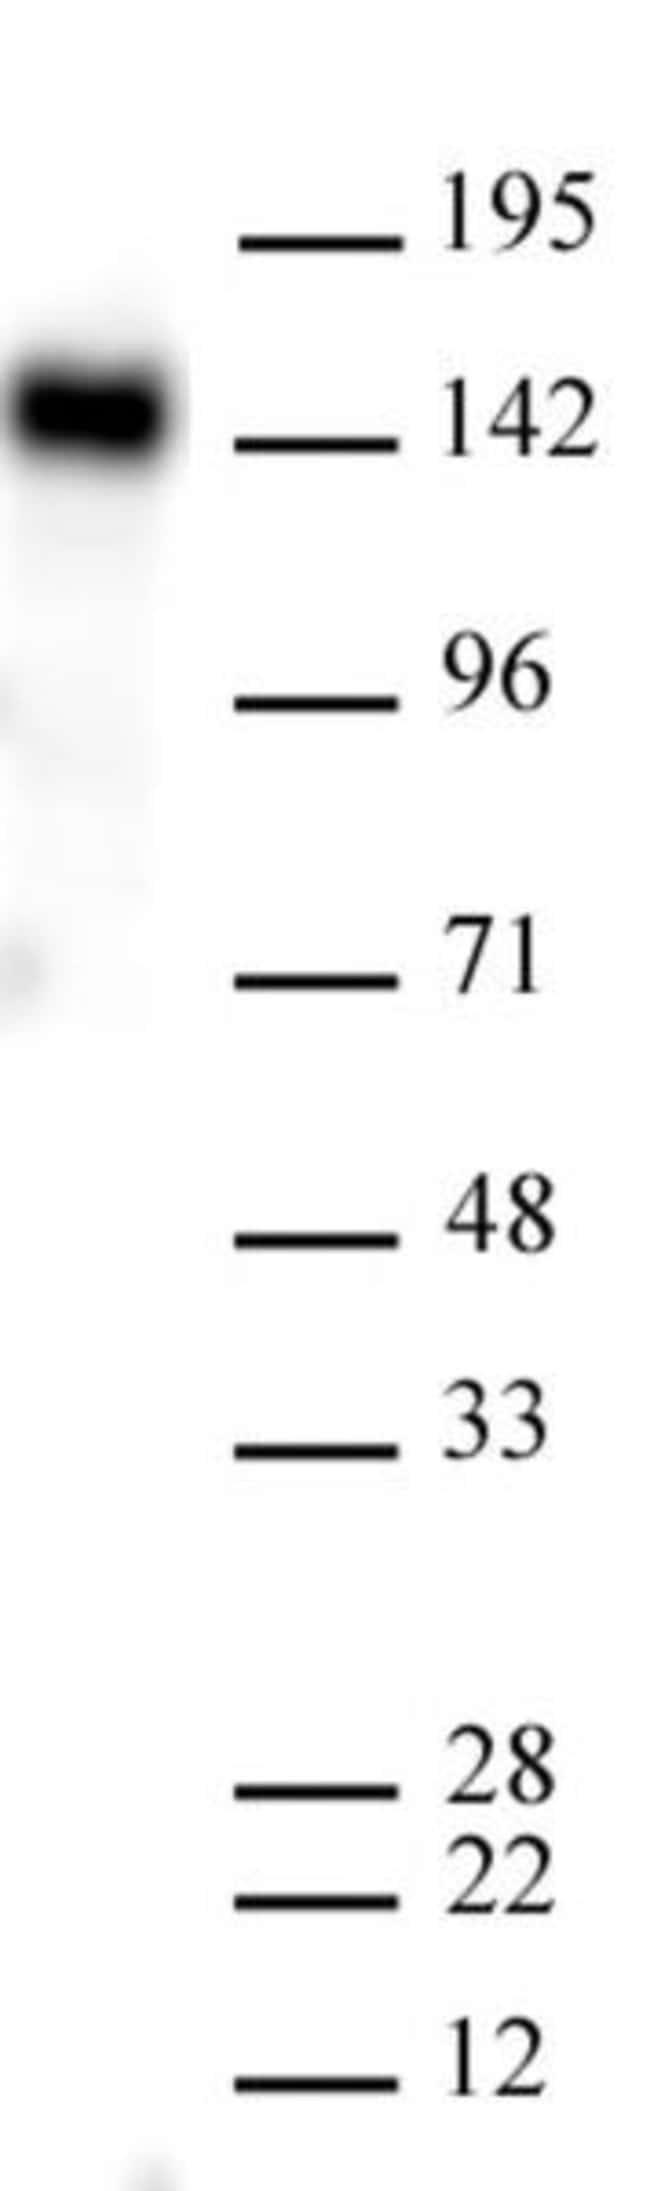 EHMT2 (G9a) Mouse anti-Human, Active Motif:Antibodies:Primary Antibodies